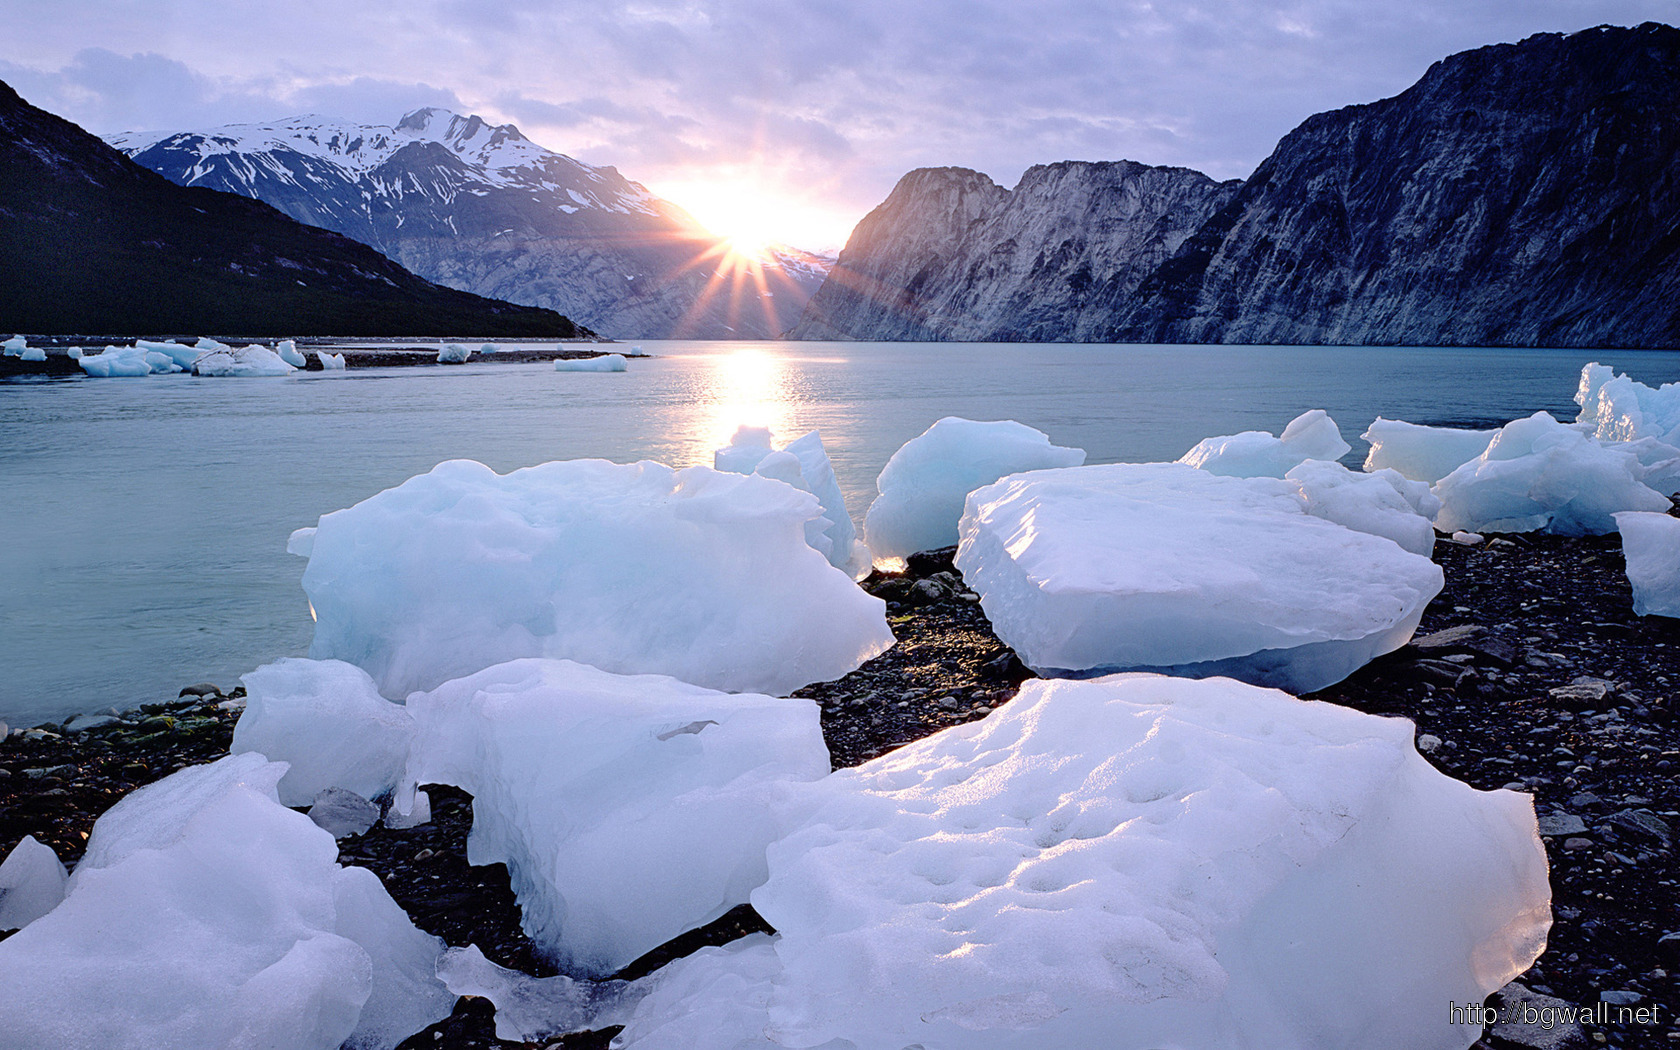 Ice Blocks Wallpaper 2402